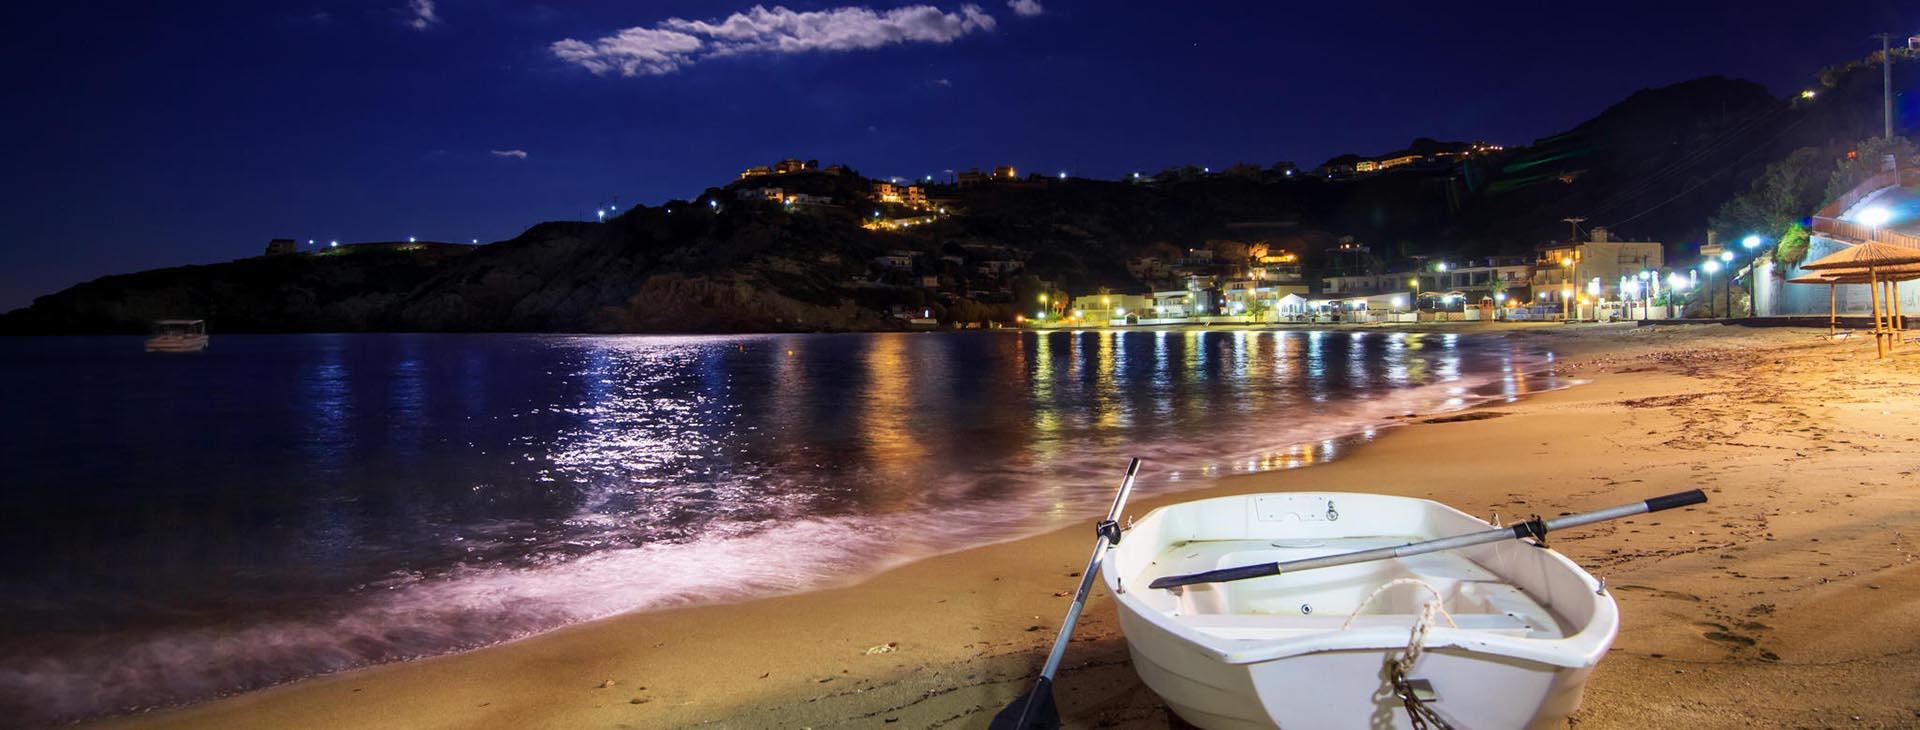 Ligaria beach near Heraklion by night, Heraklion